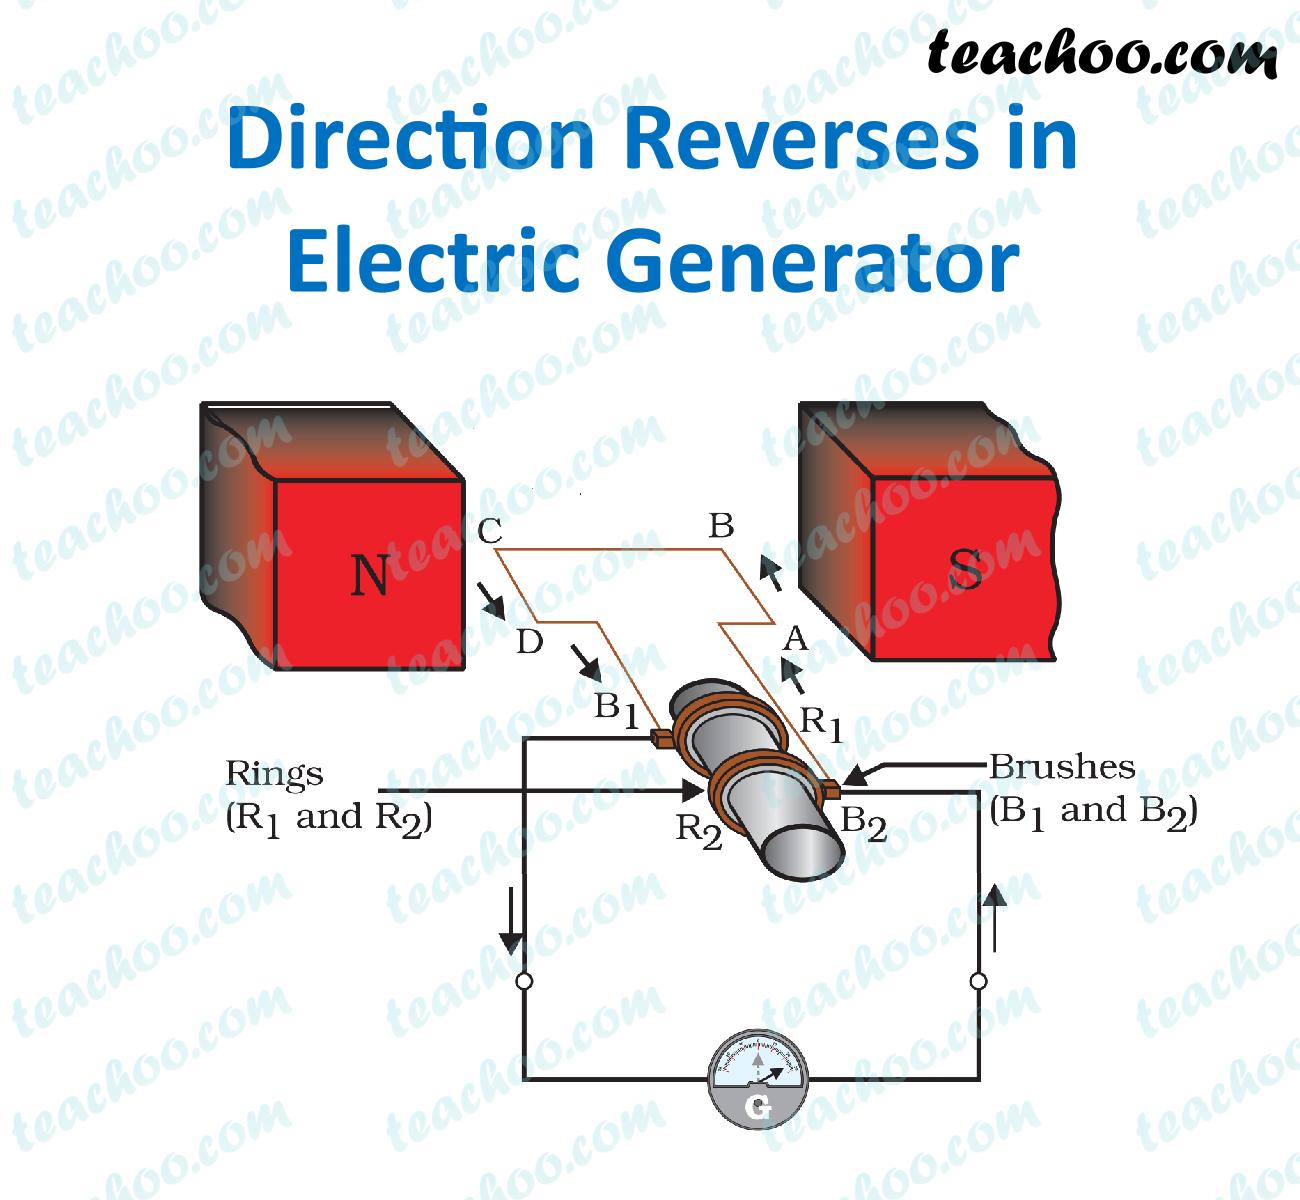 electric-generator---direction-reverses---teachoo.jpg